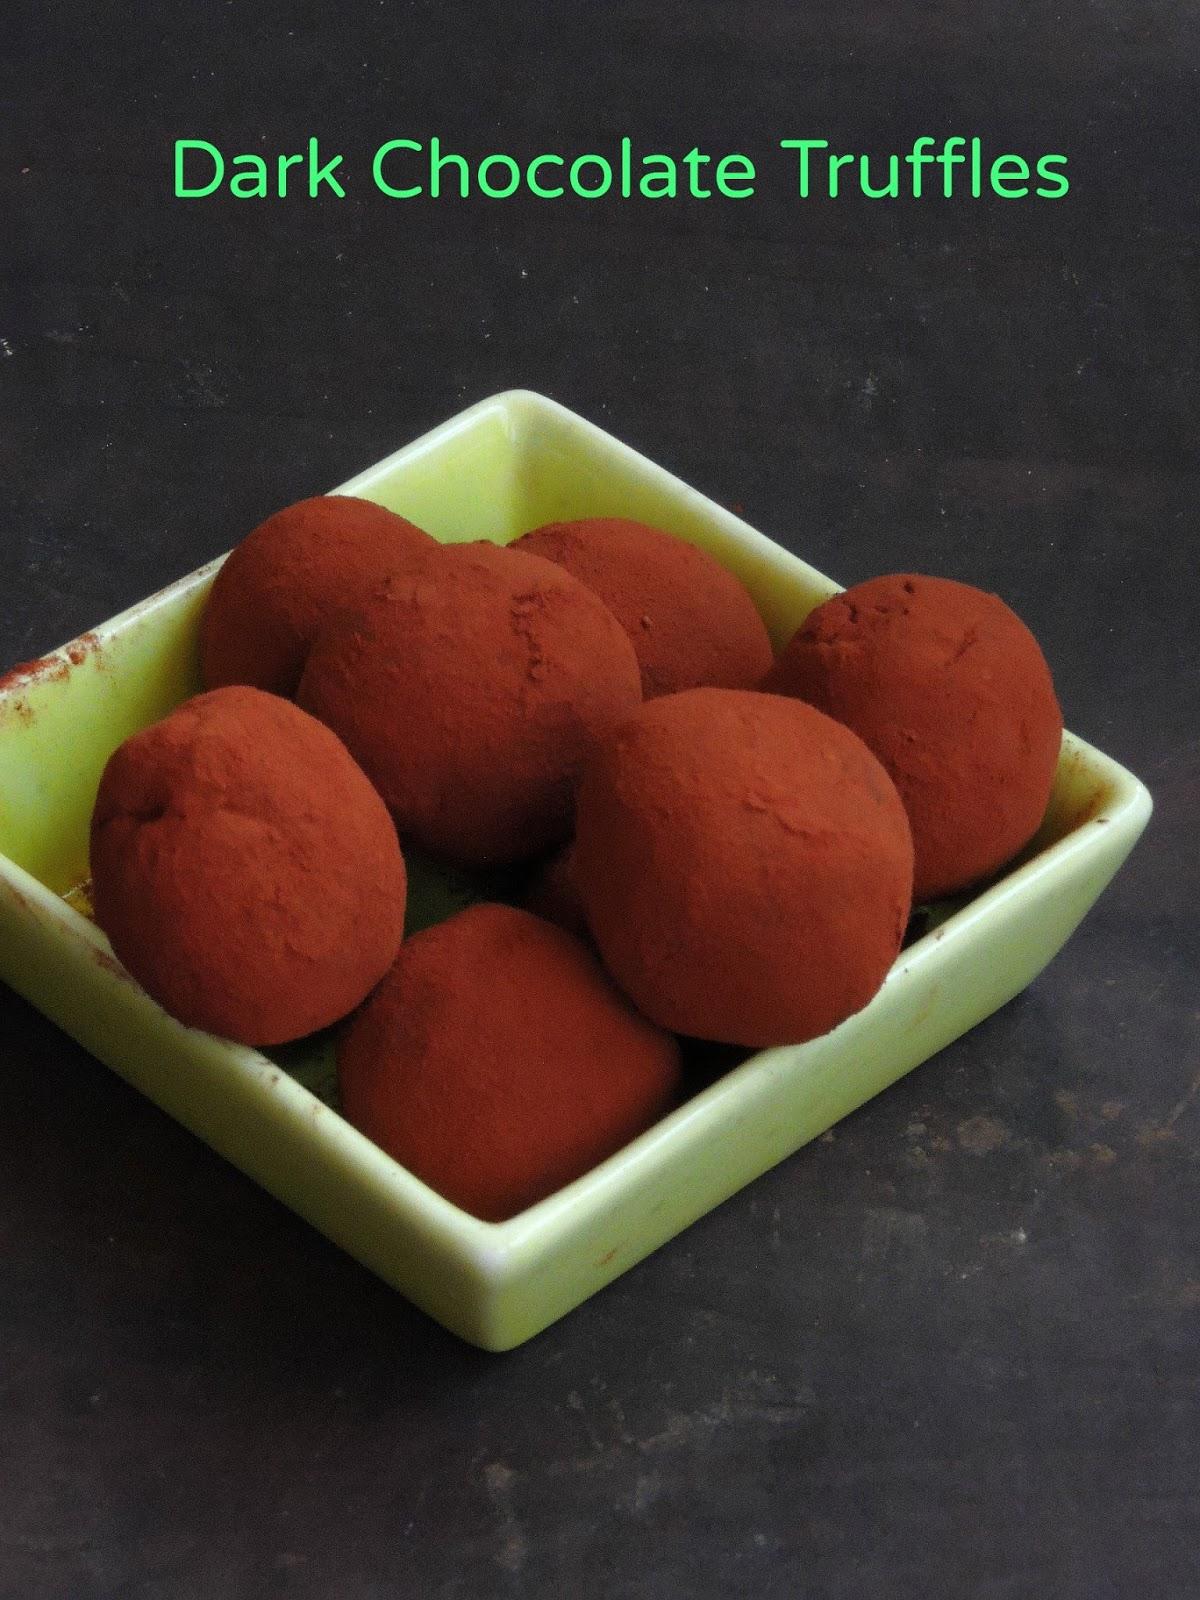 Homemade Dark Chocolate Truffles | Cook N Click